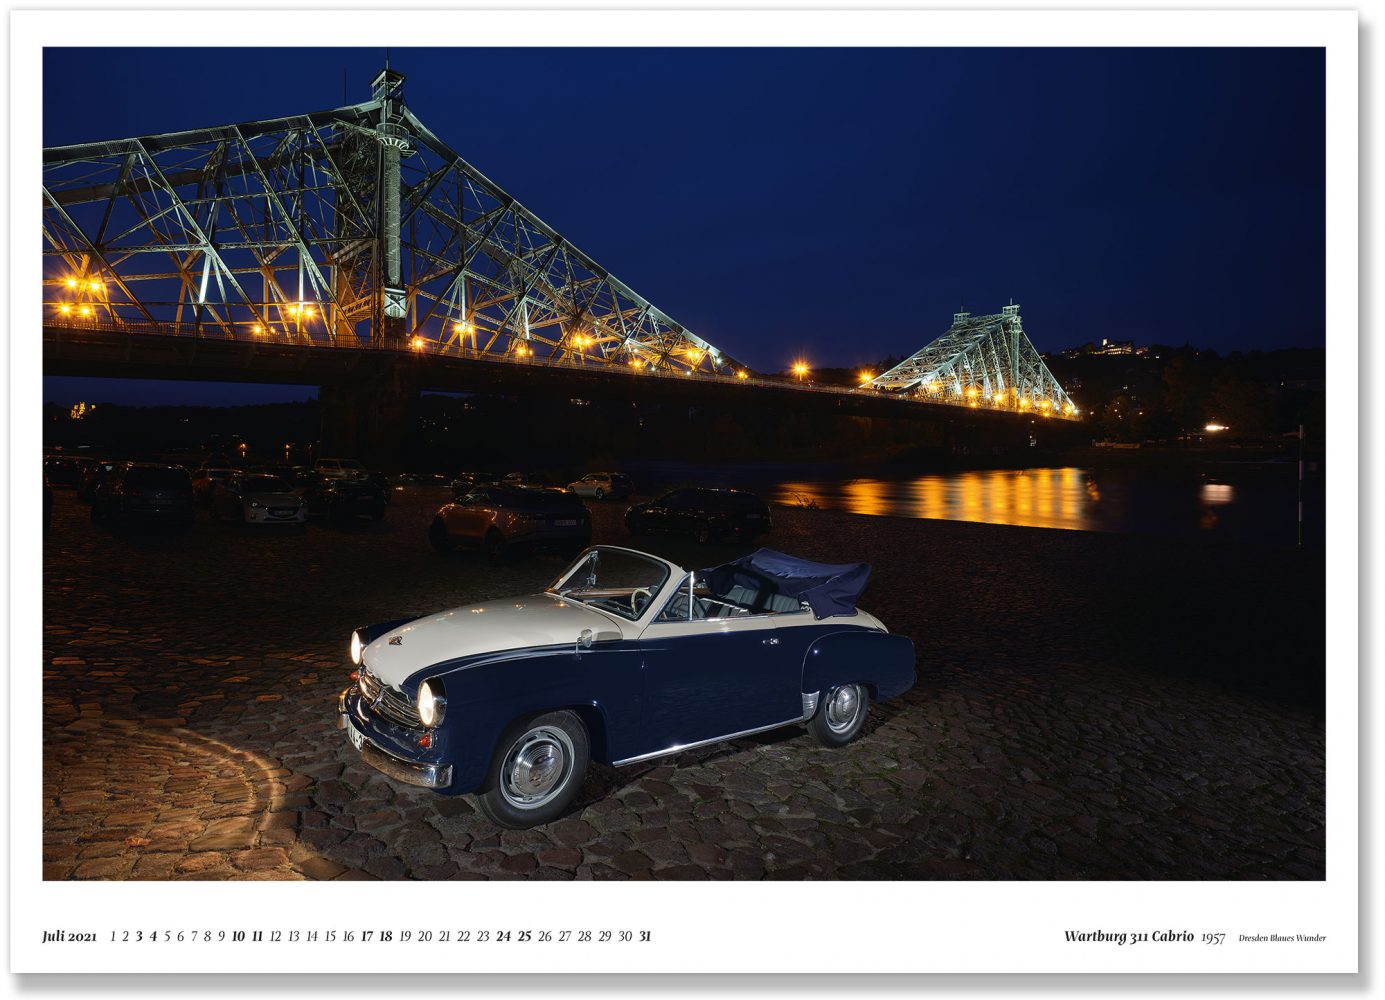 Wartburg 311 Cabrio 1957 Dresden Blaues Wunder